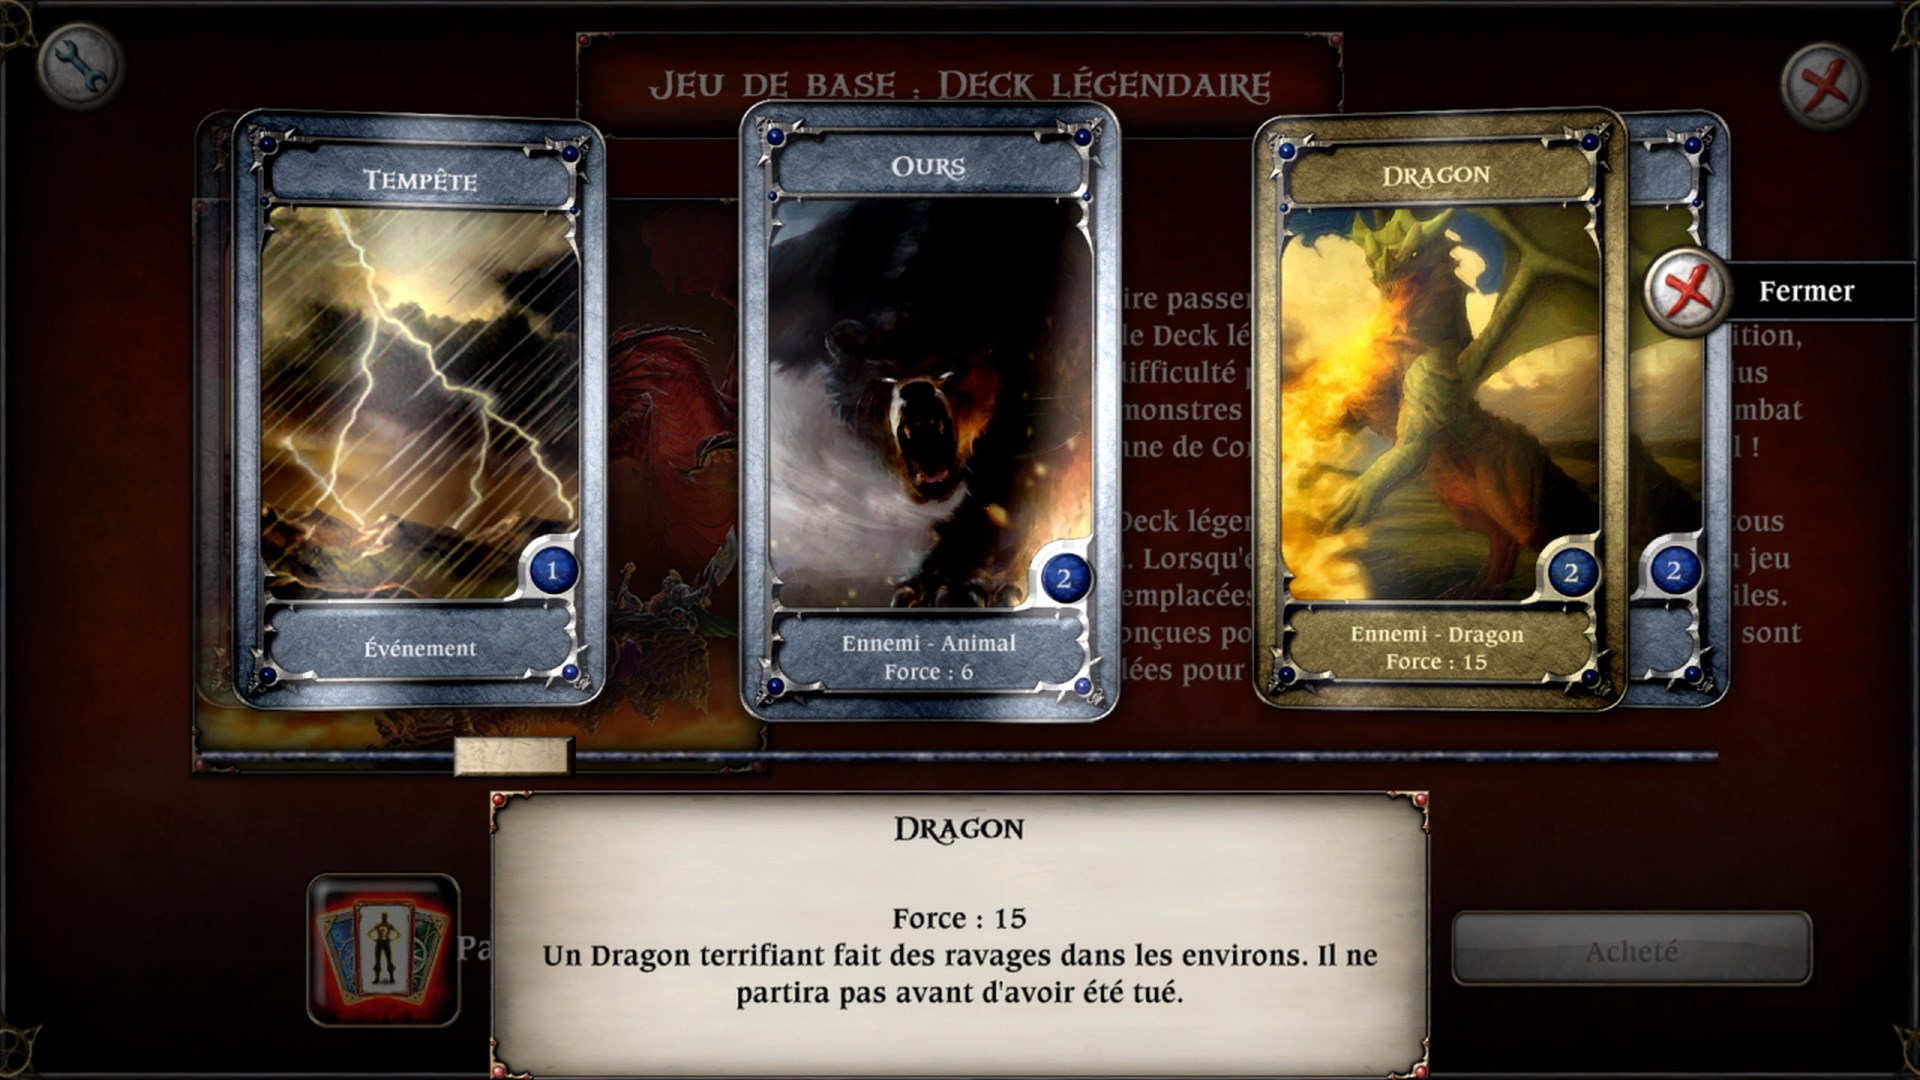 Talisman: Digital Edition - Base Game: Legendary Deck